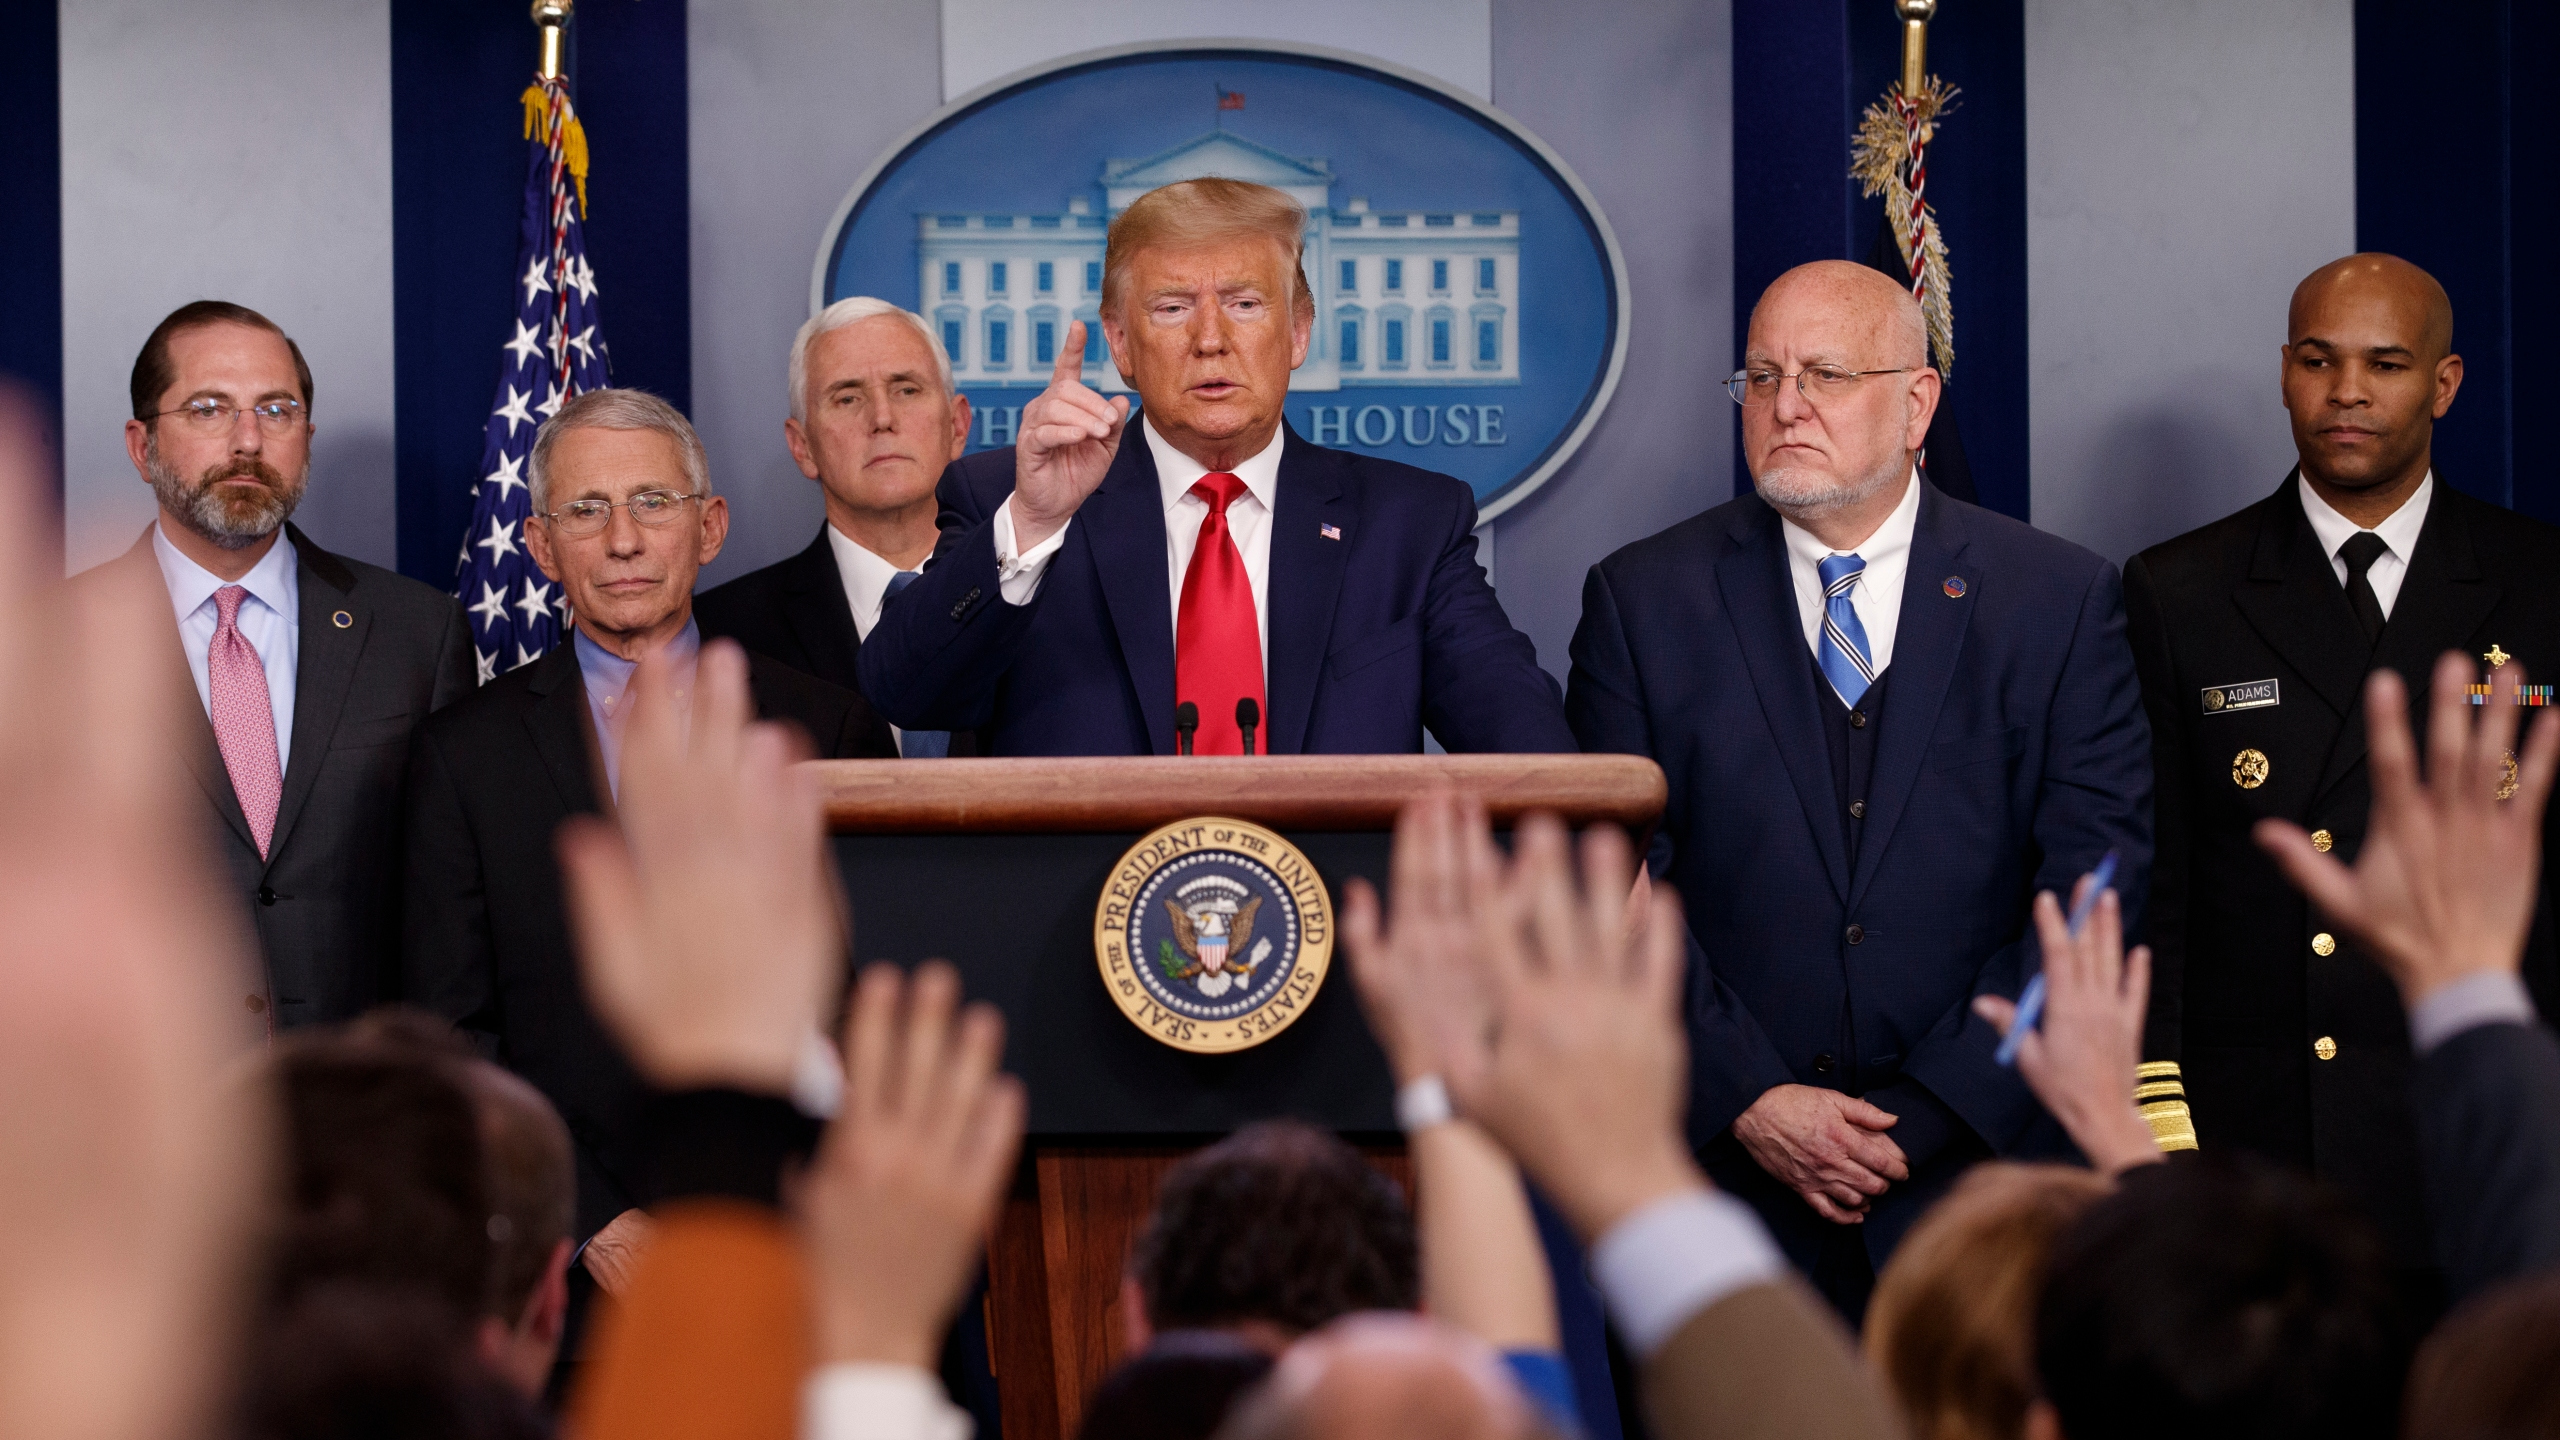 Donald Trump, Mike Pence, Alex Azar, Anthony Fauci, Robert Redfield, Jerome Adams